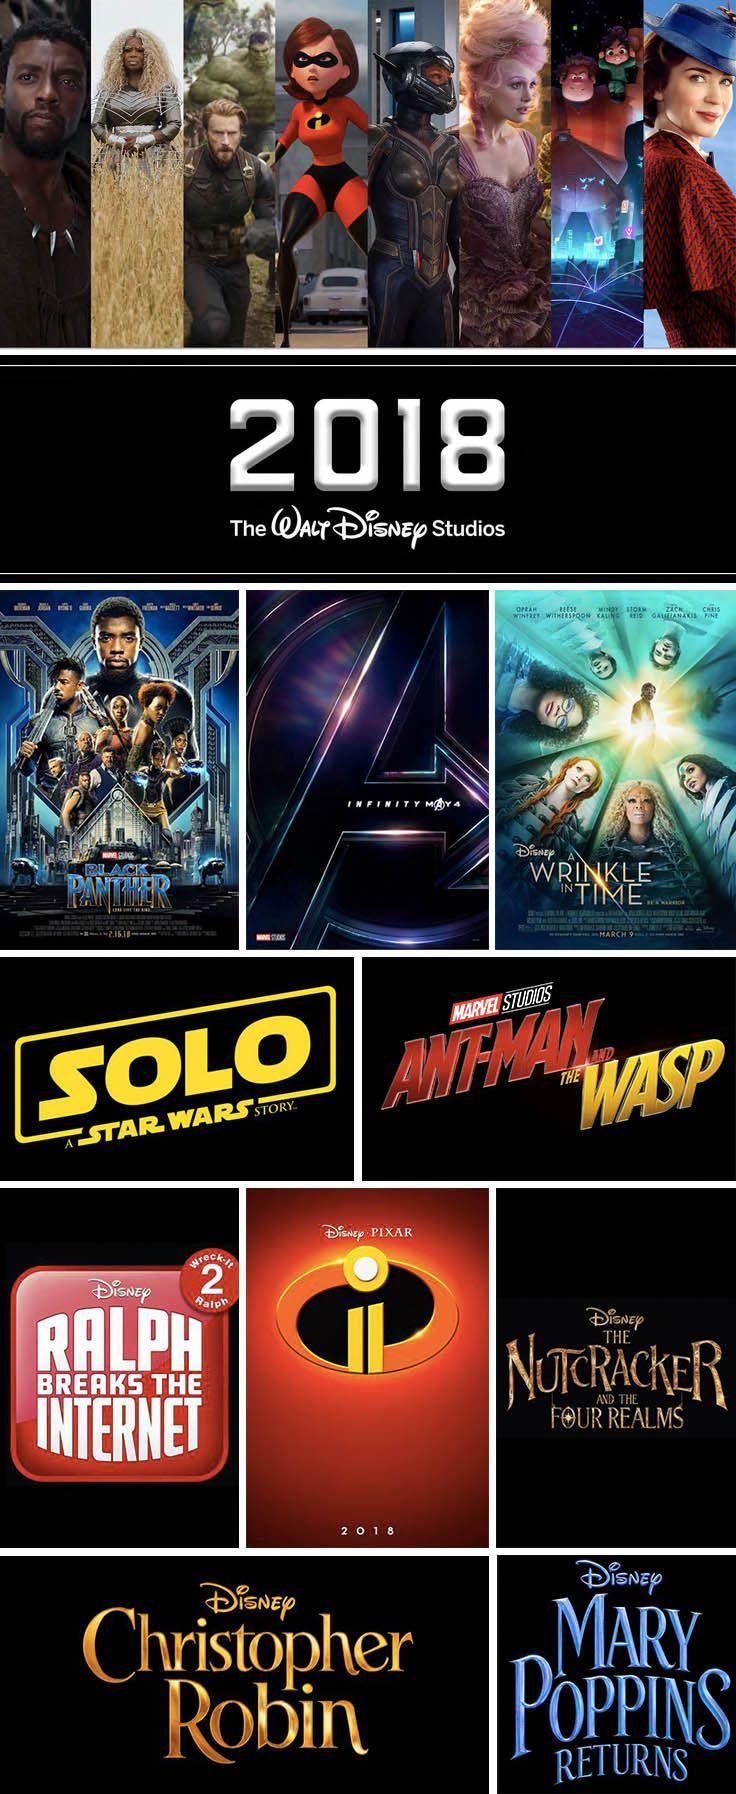 2018 Disney Movies + Marvel, LucasFilm, and Pixar Motion